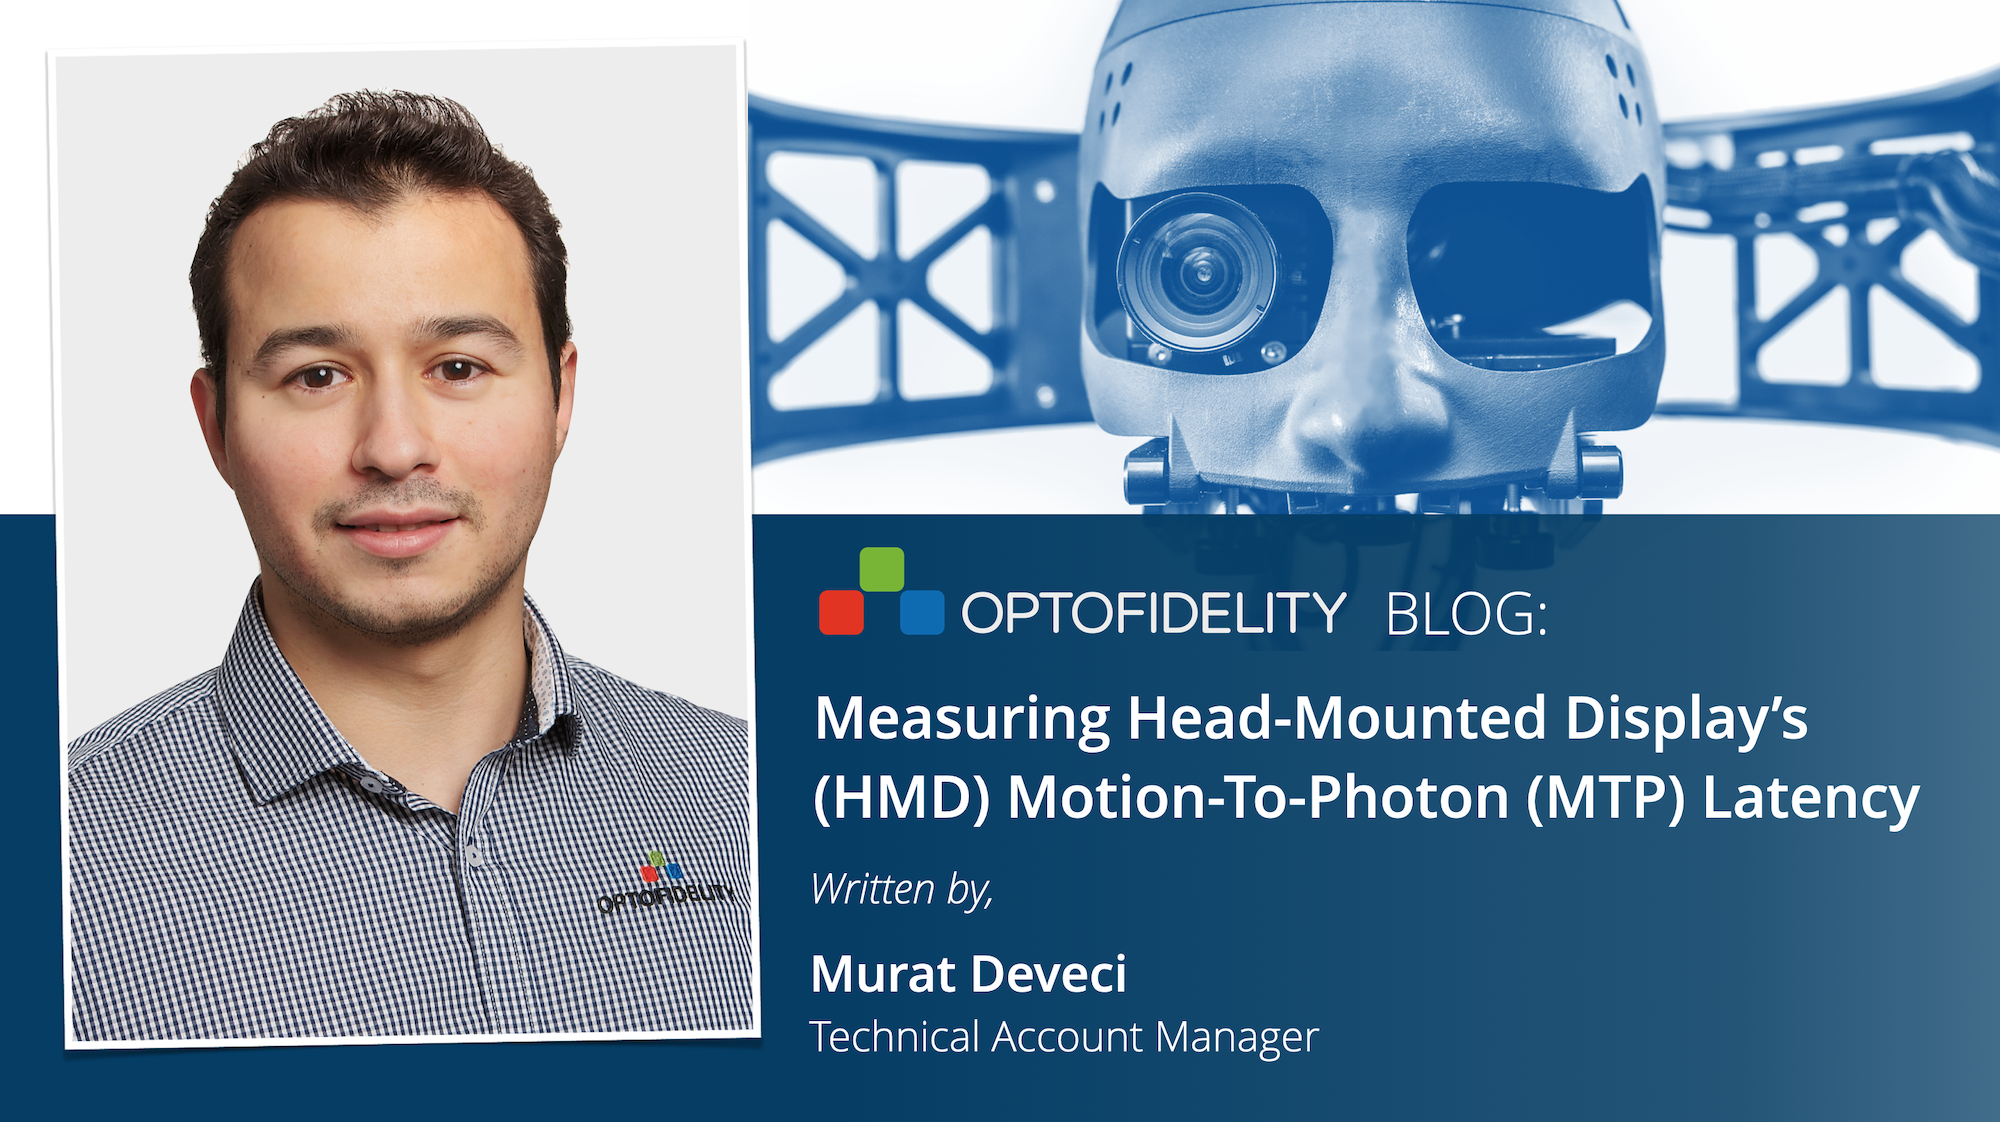 https://f.hubspotusercontent10.net/hubfs/6347010/OptoFidelity_blog_Measuring_Head-Mounted_Dislays_HMD_Motion-to_Photon_MTP_Latency_written_by_Murat_Deveci_rectangle.png